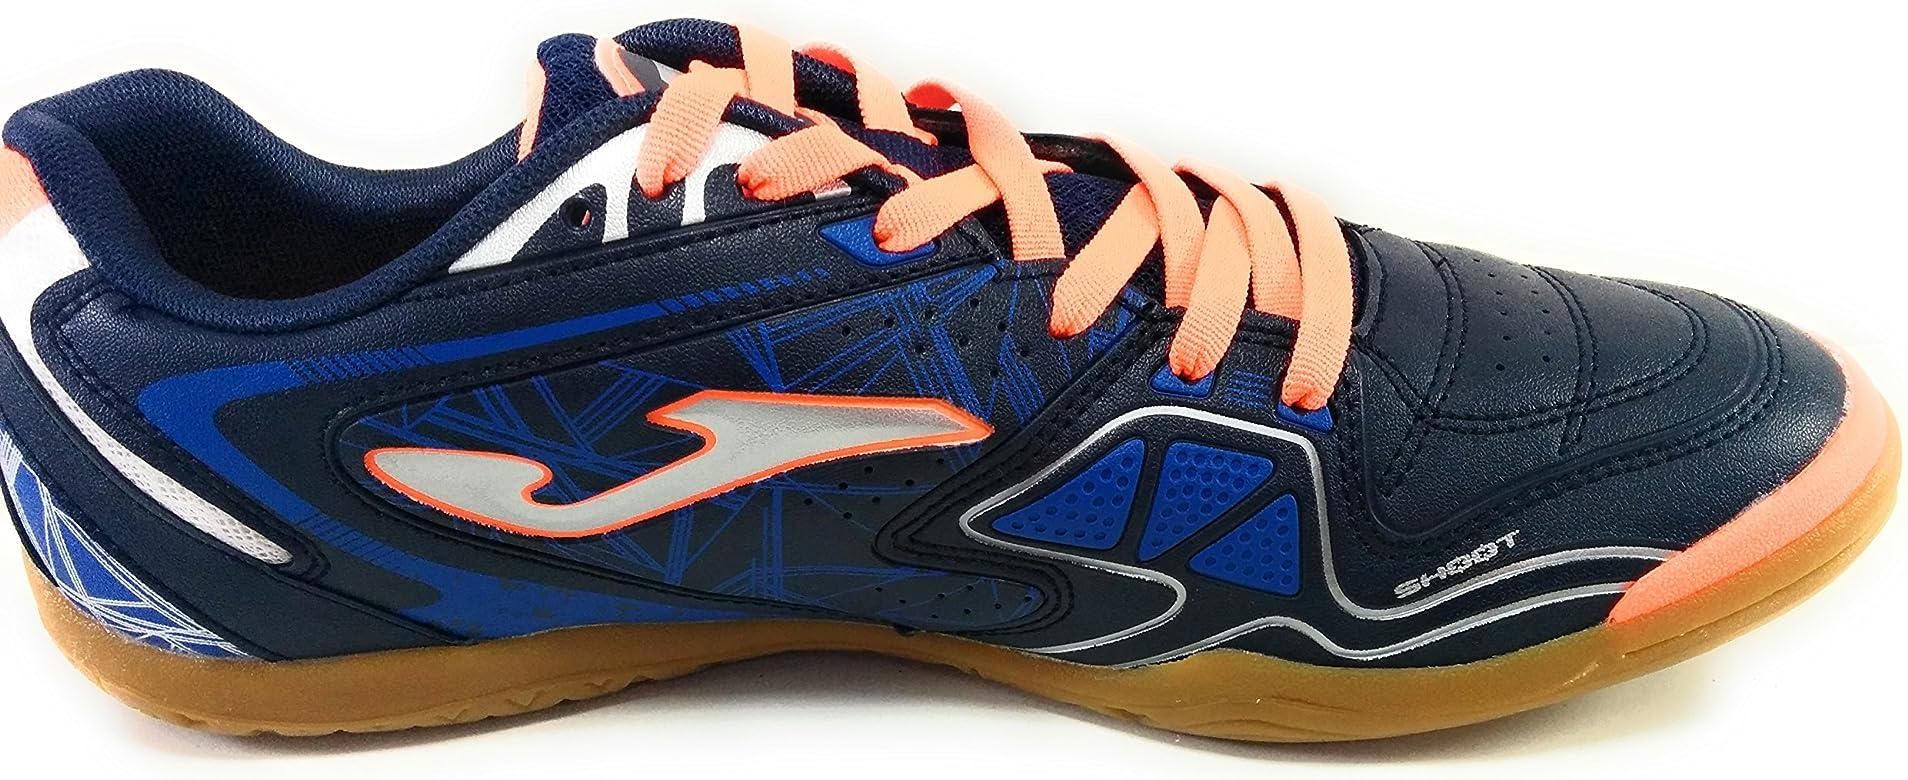 Adidas Super Sala naranja fluor zapatillas de fútbol sala para hombre